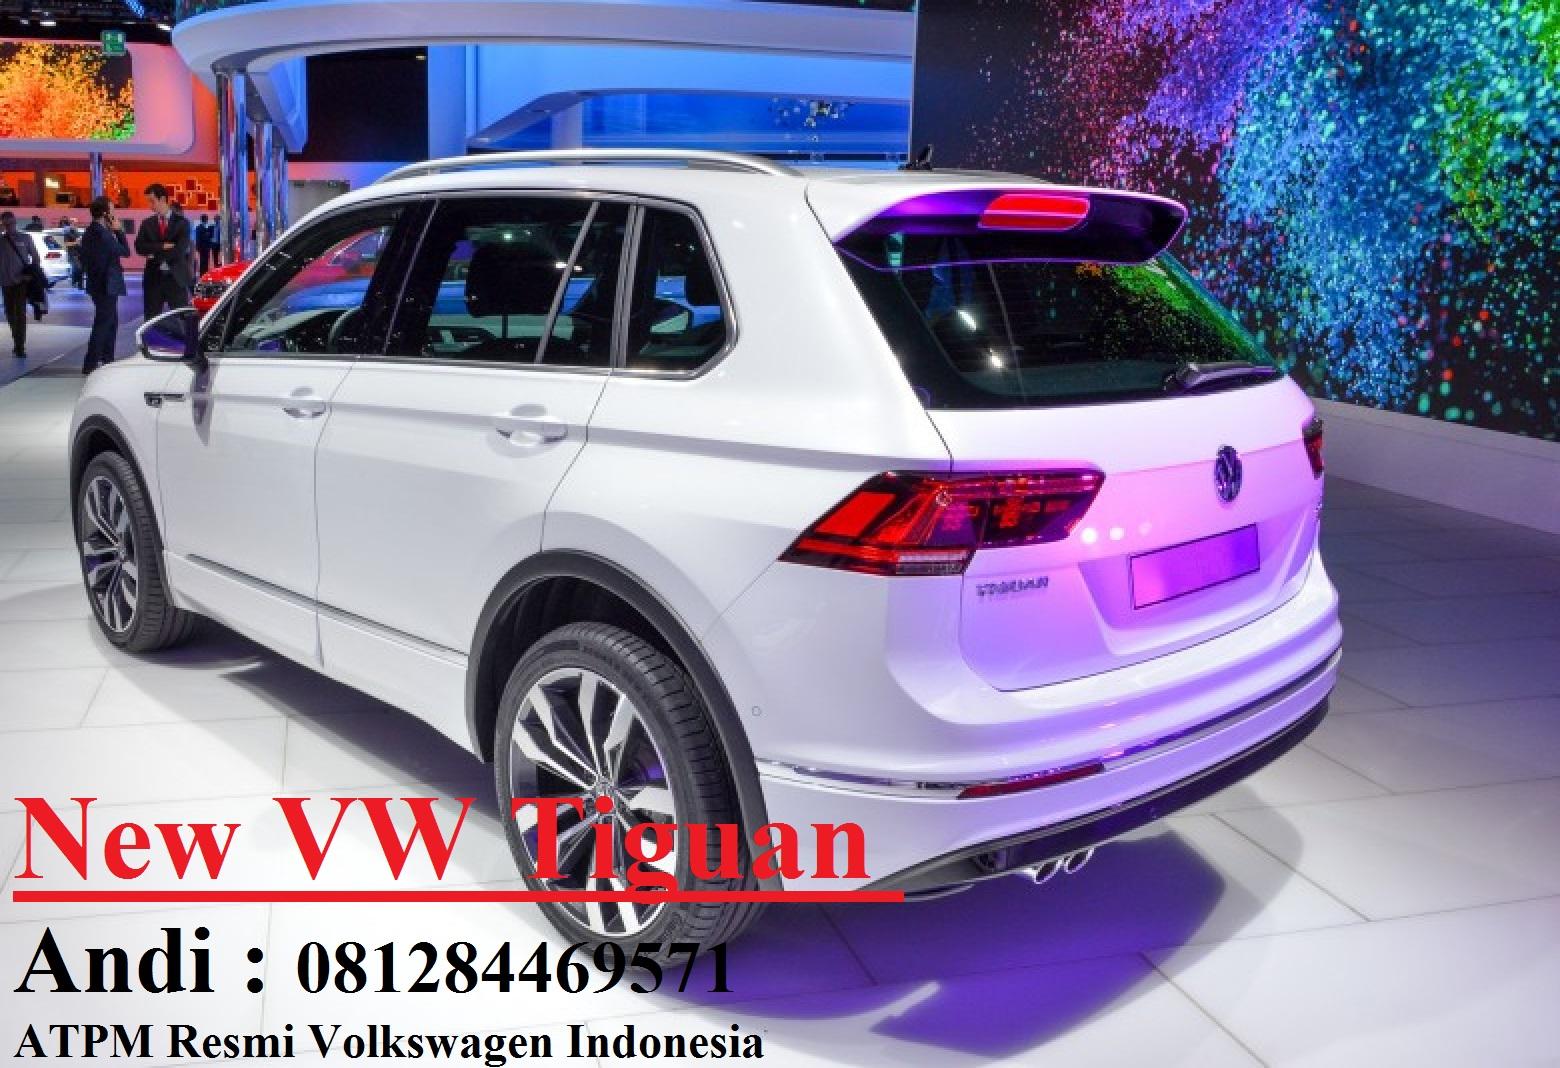 all new camry 2017 indonesia harga grand avanza pertama showroom vw jakarta on the road